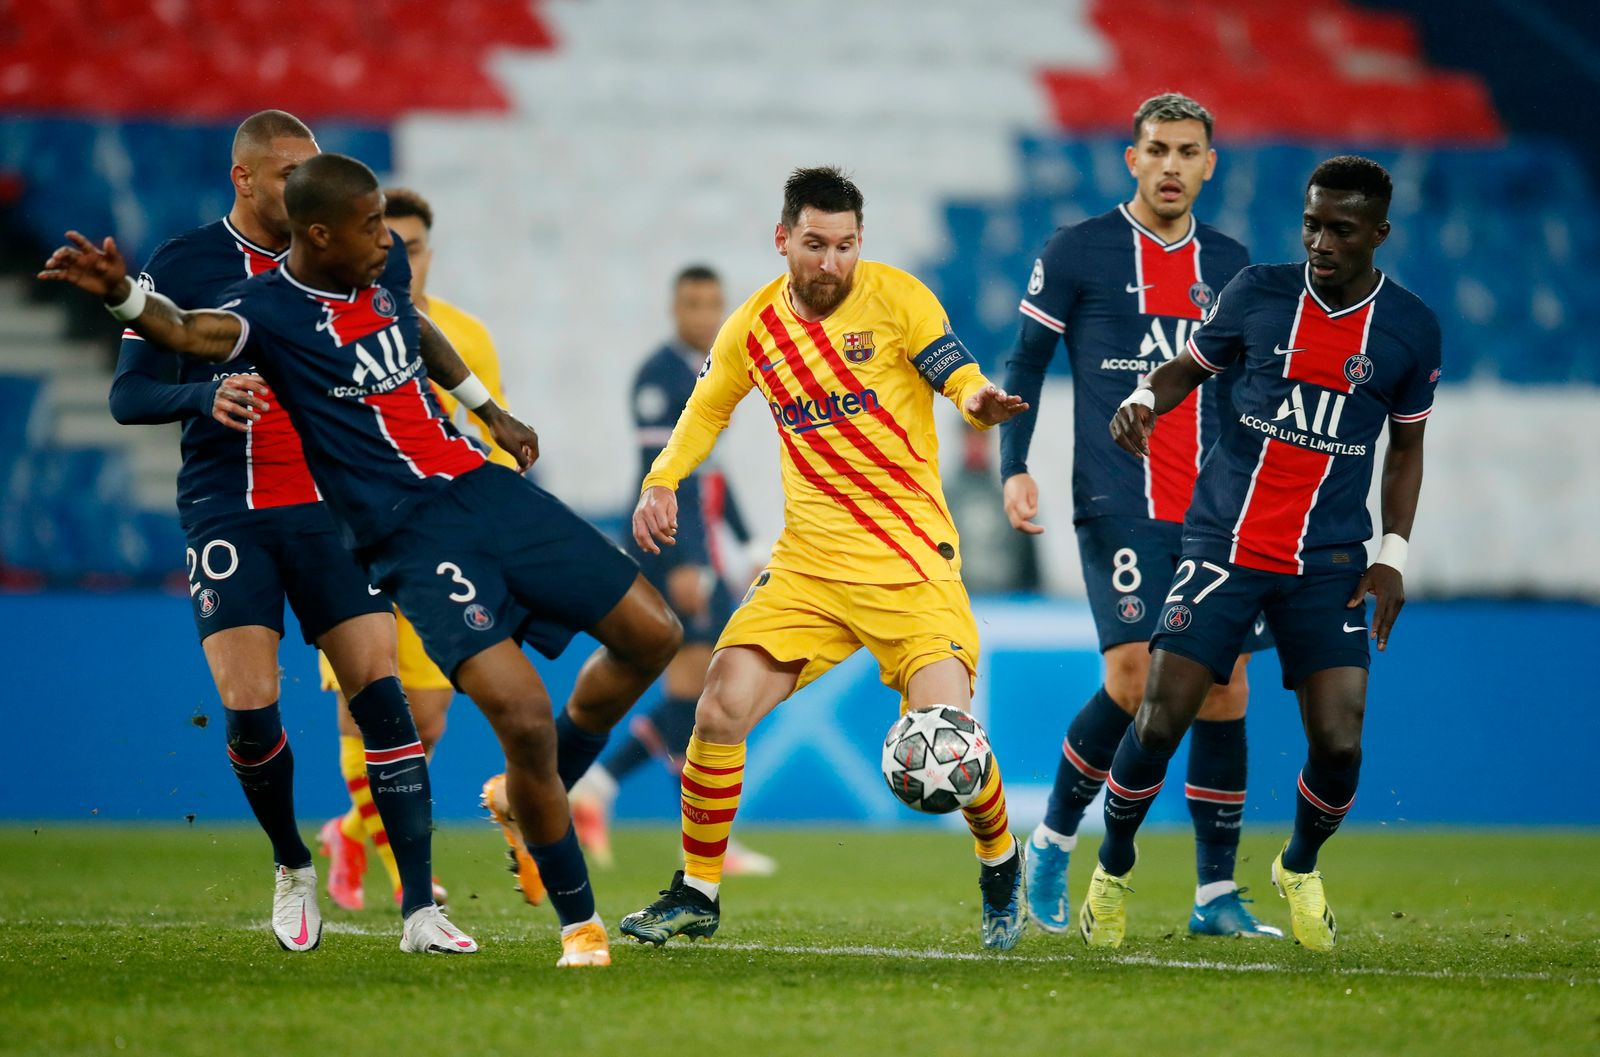 Champions League - Round of 16 Second Leg - Paris St Germain v FC Barcelona